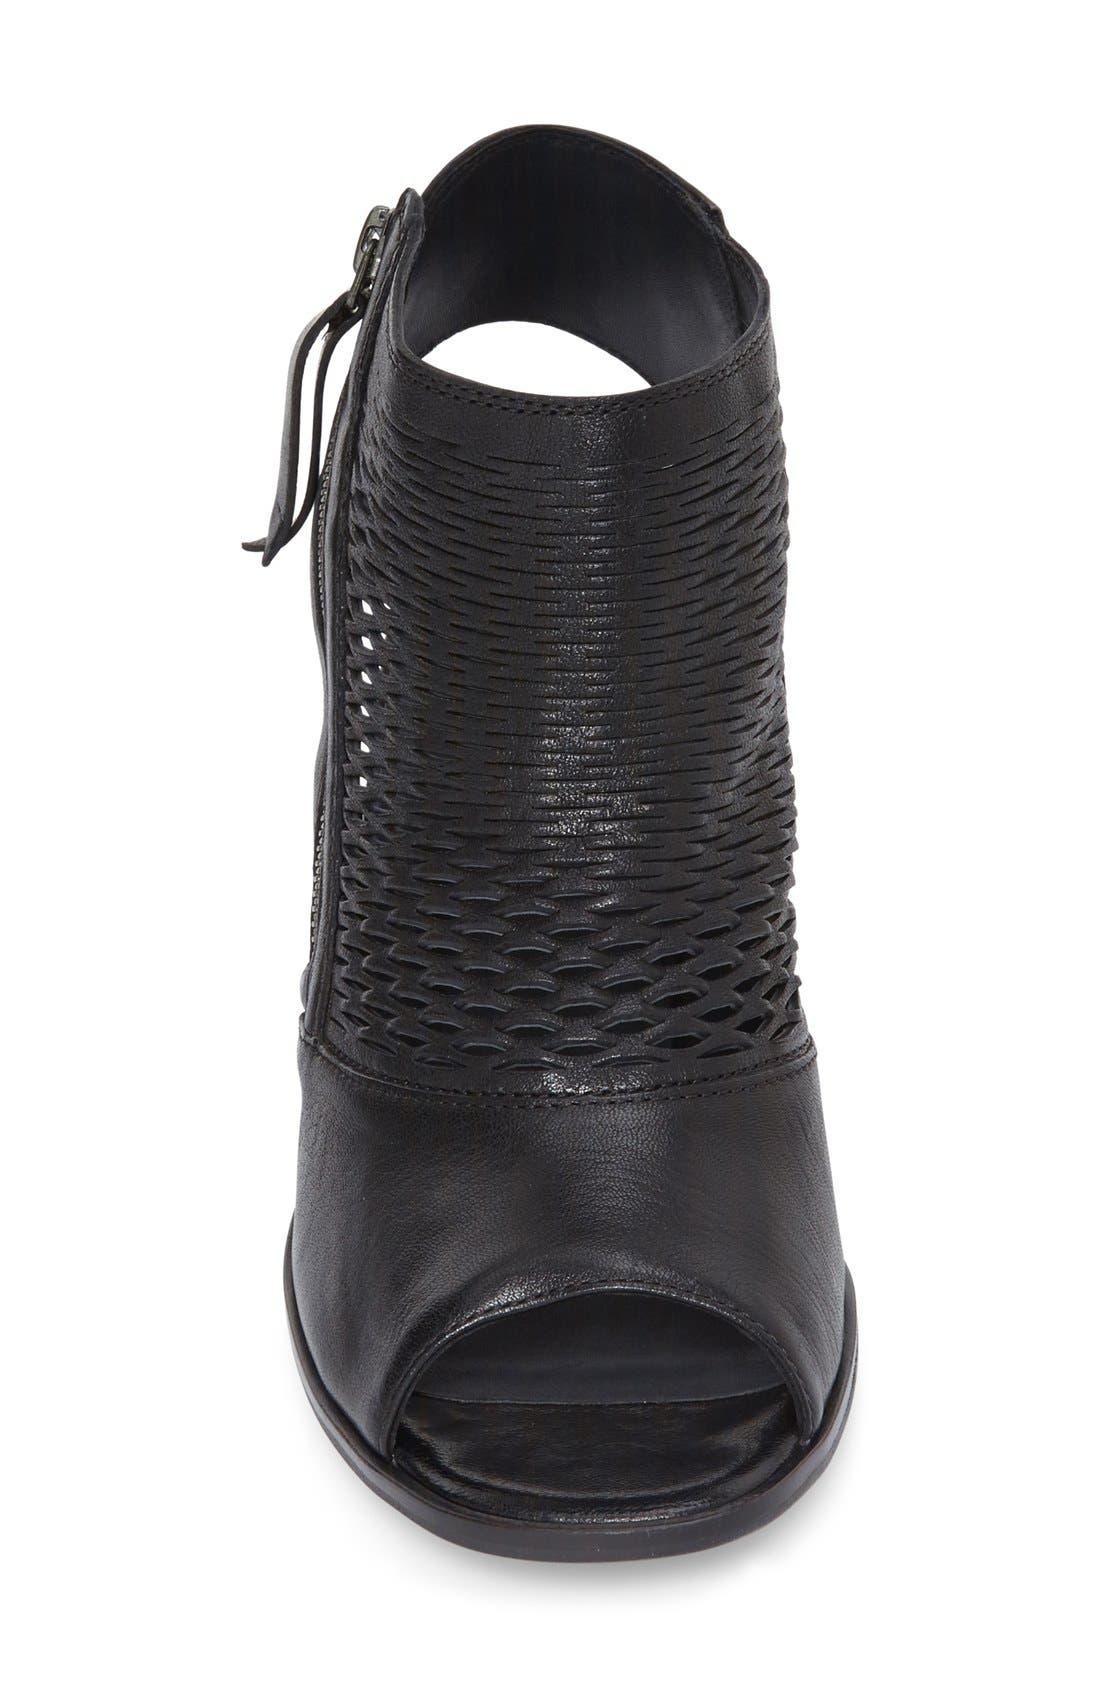 'Willow' Peep Toe Sandal,                             Alternate thumbnail 4, color,                             Black Leather